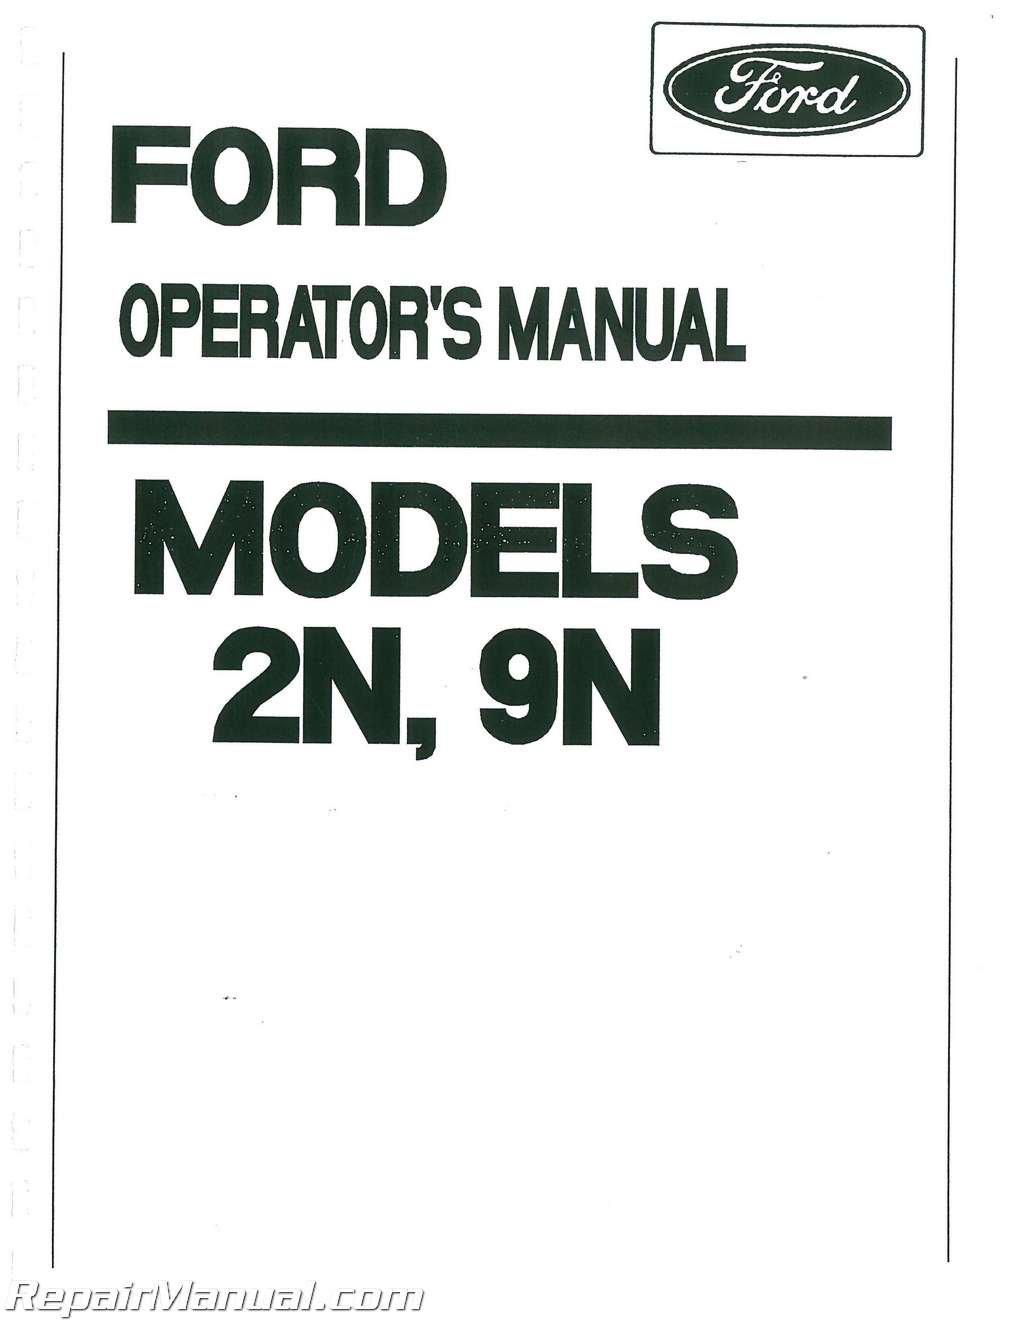 Ford 2N 9N Tractor Operators Manual